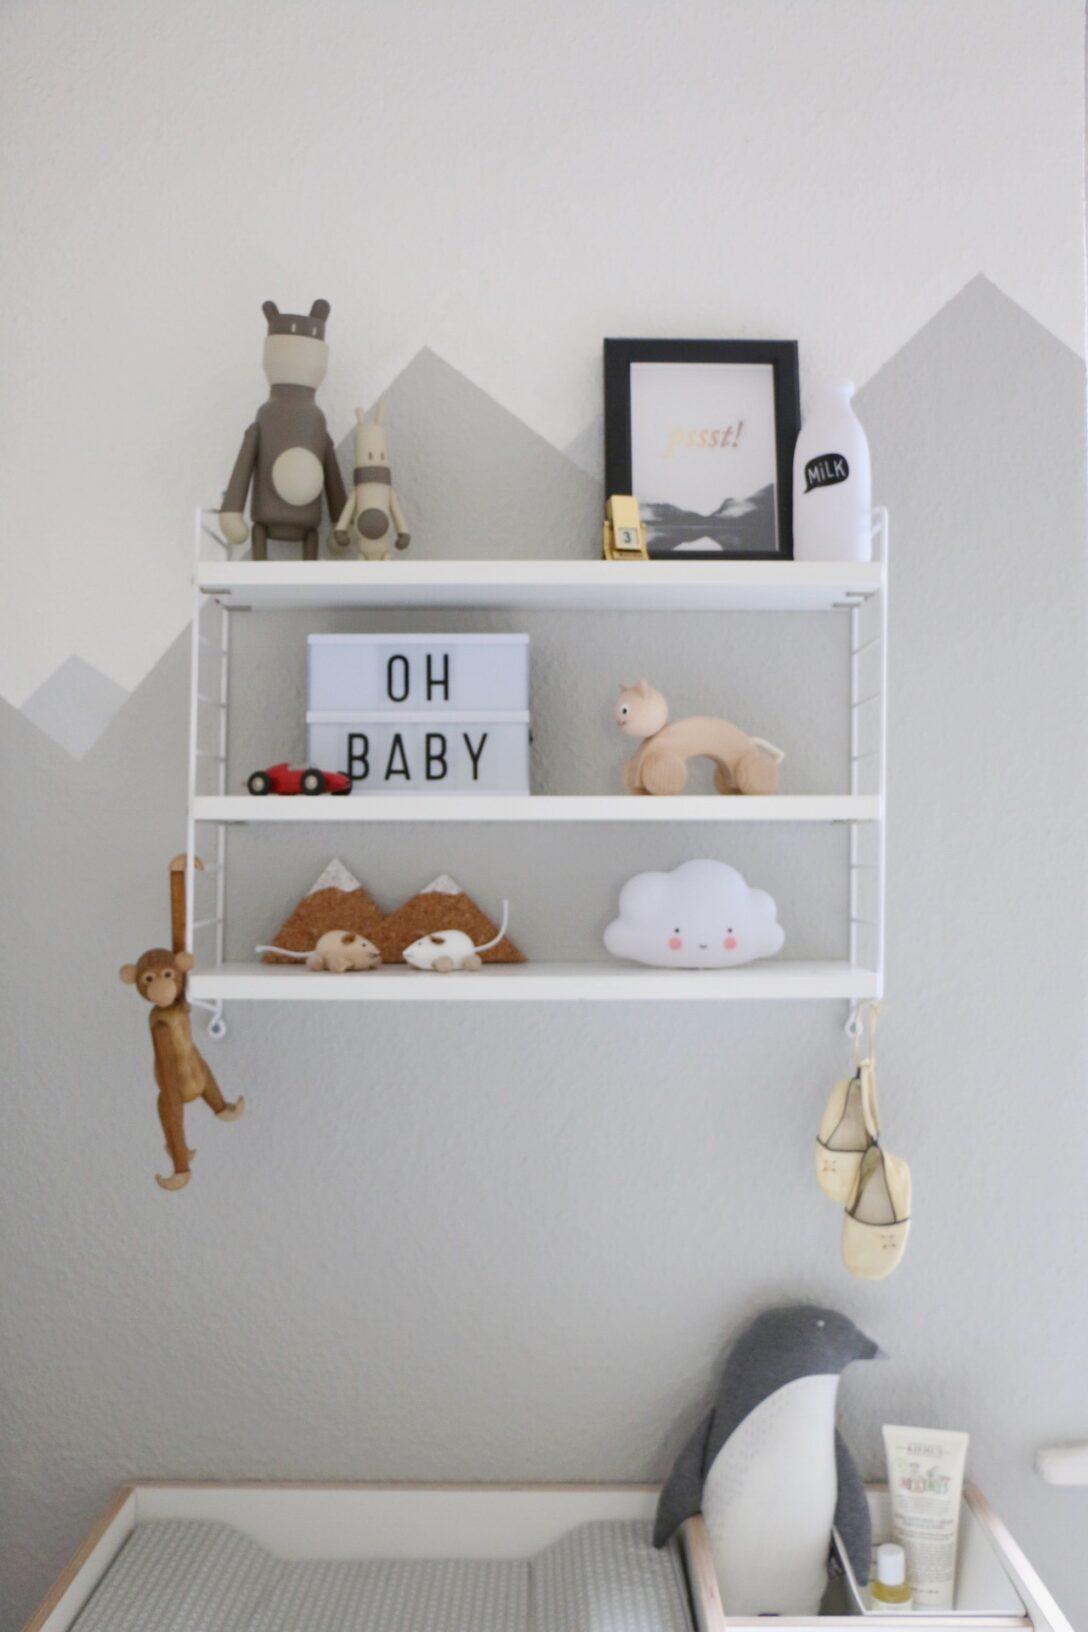 Wandgestaltung Kinderzimmer Jungen Mountain Nursery Wallpaint Im Babyzimmer Eat Regal Regale Sofa Weiß